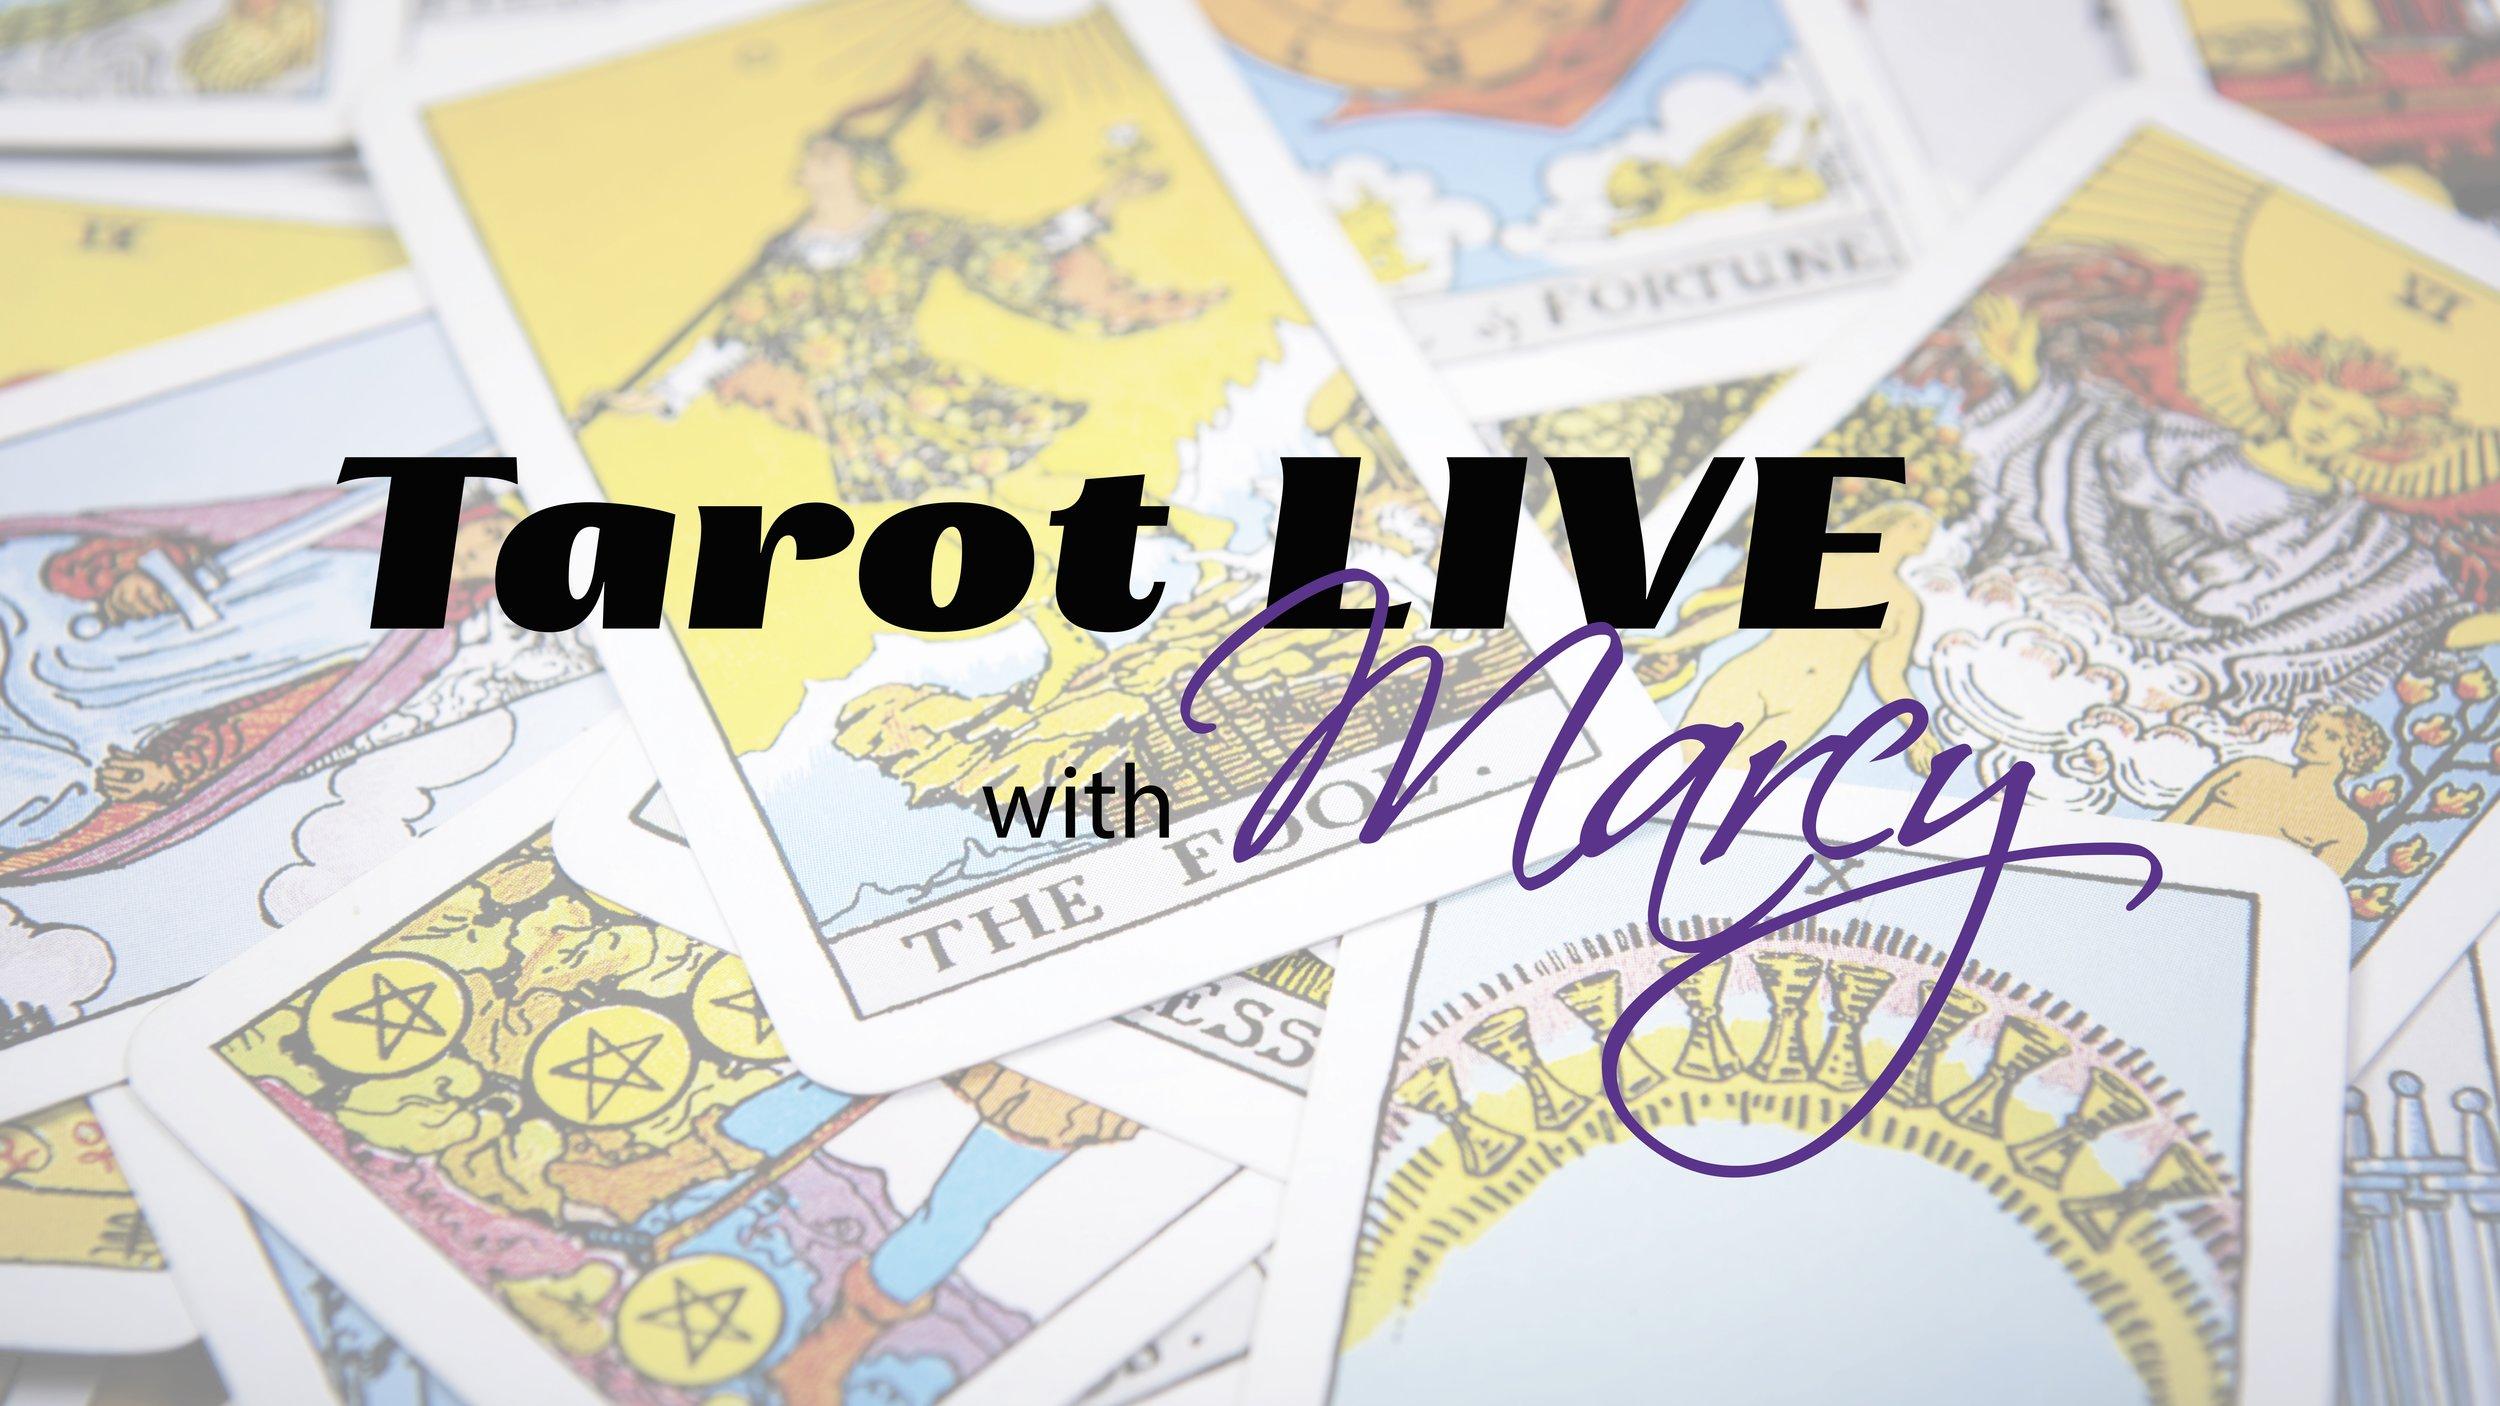 Tarot live calendar image copy.jpg